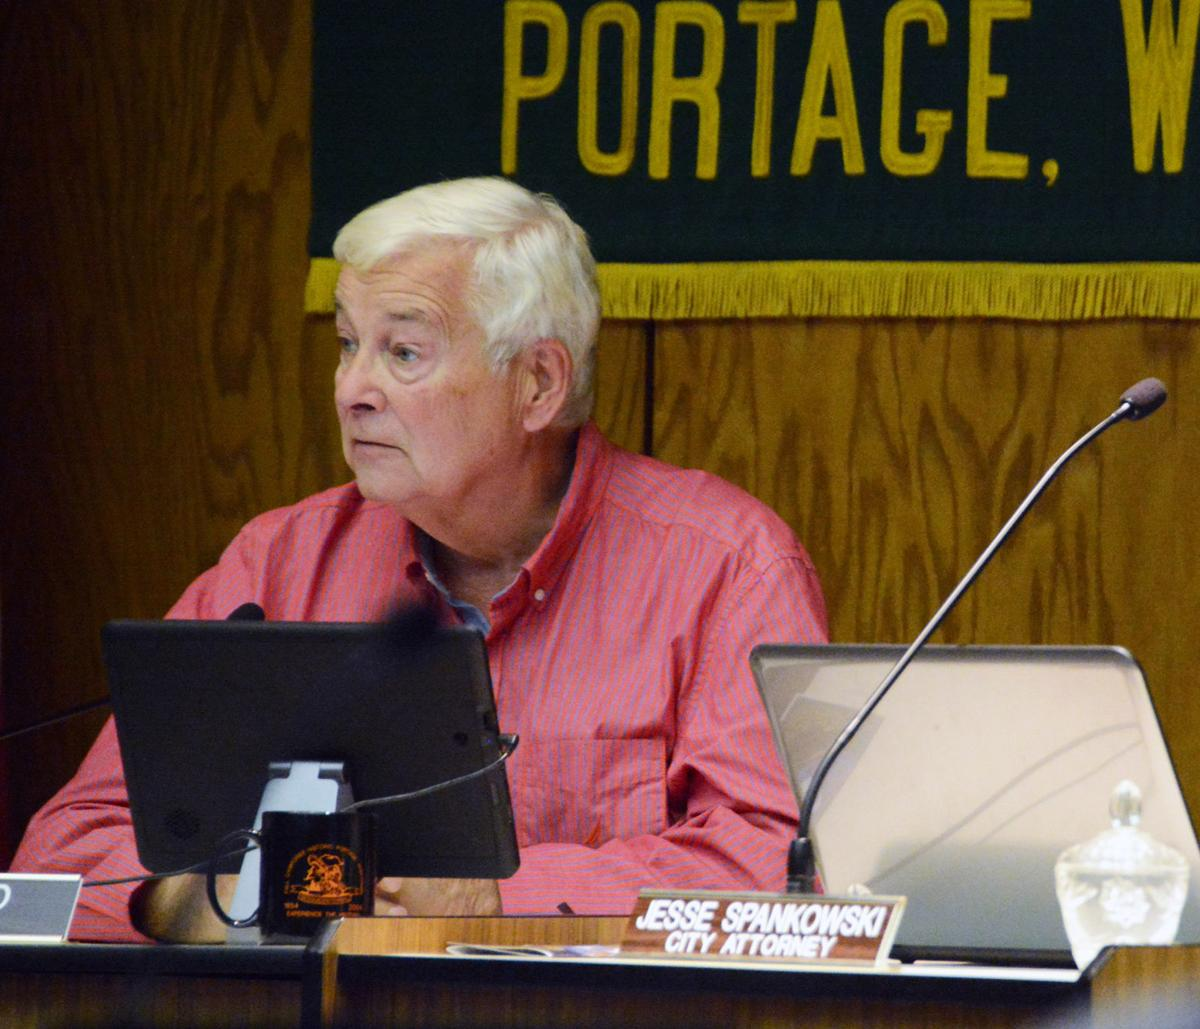 Portage Mayor Rick Dodd